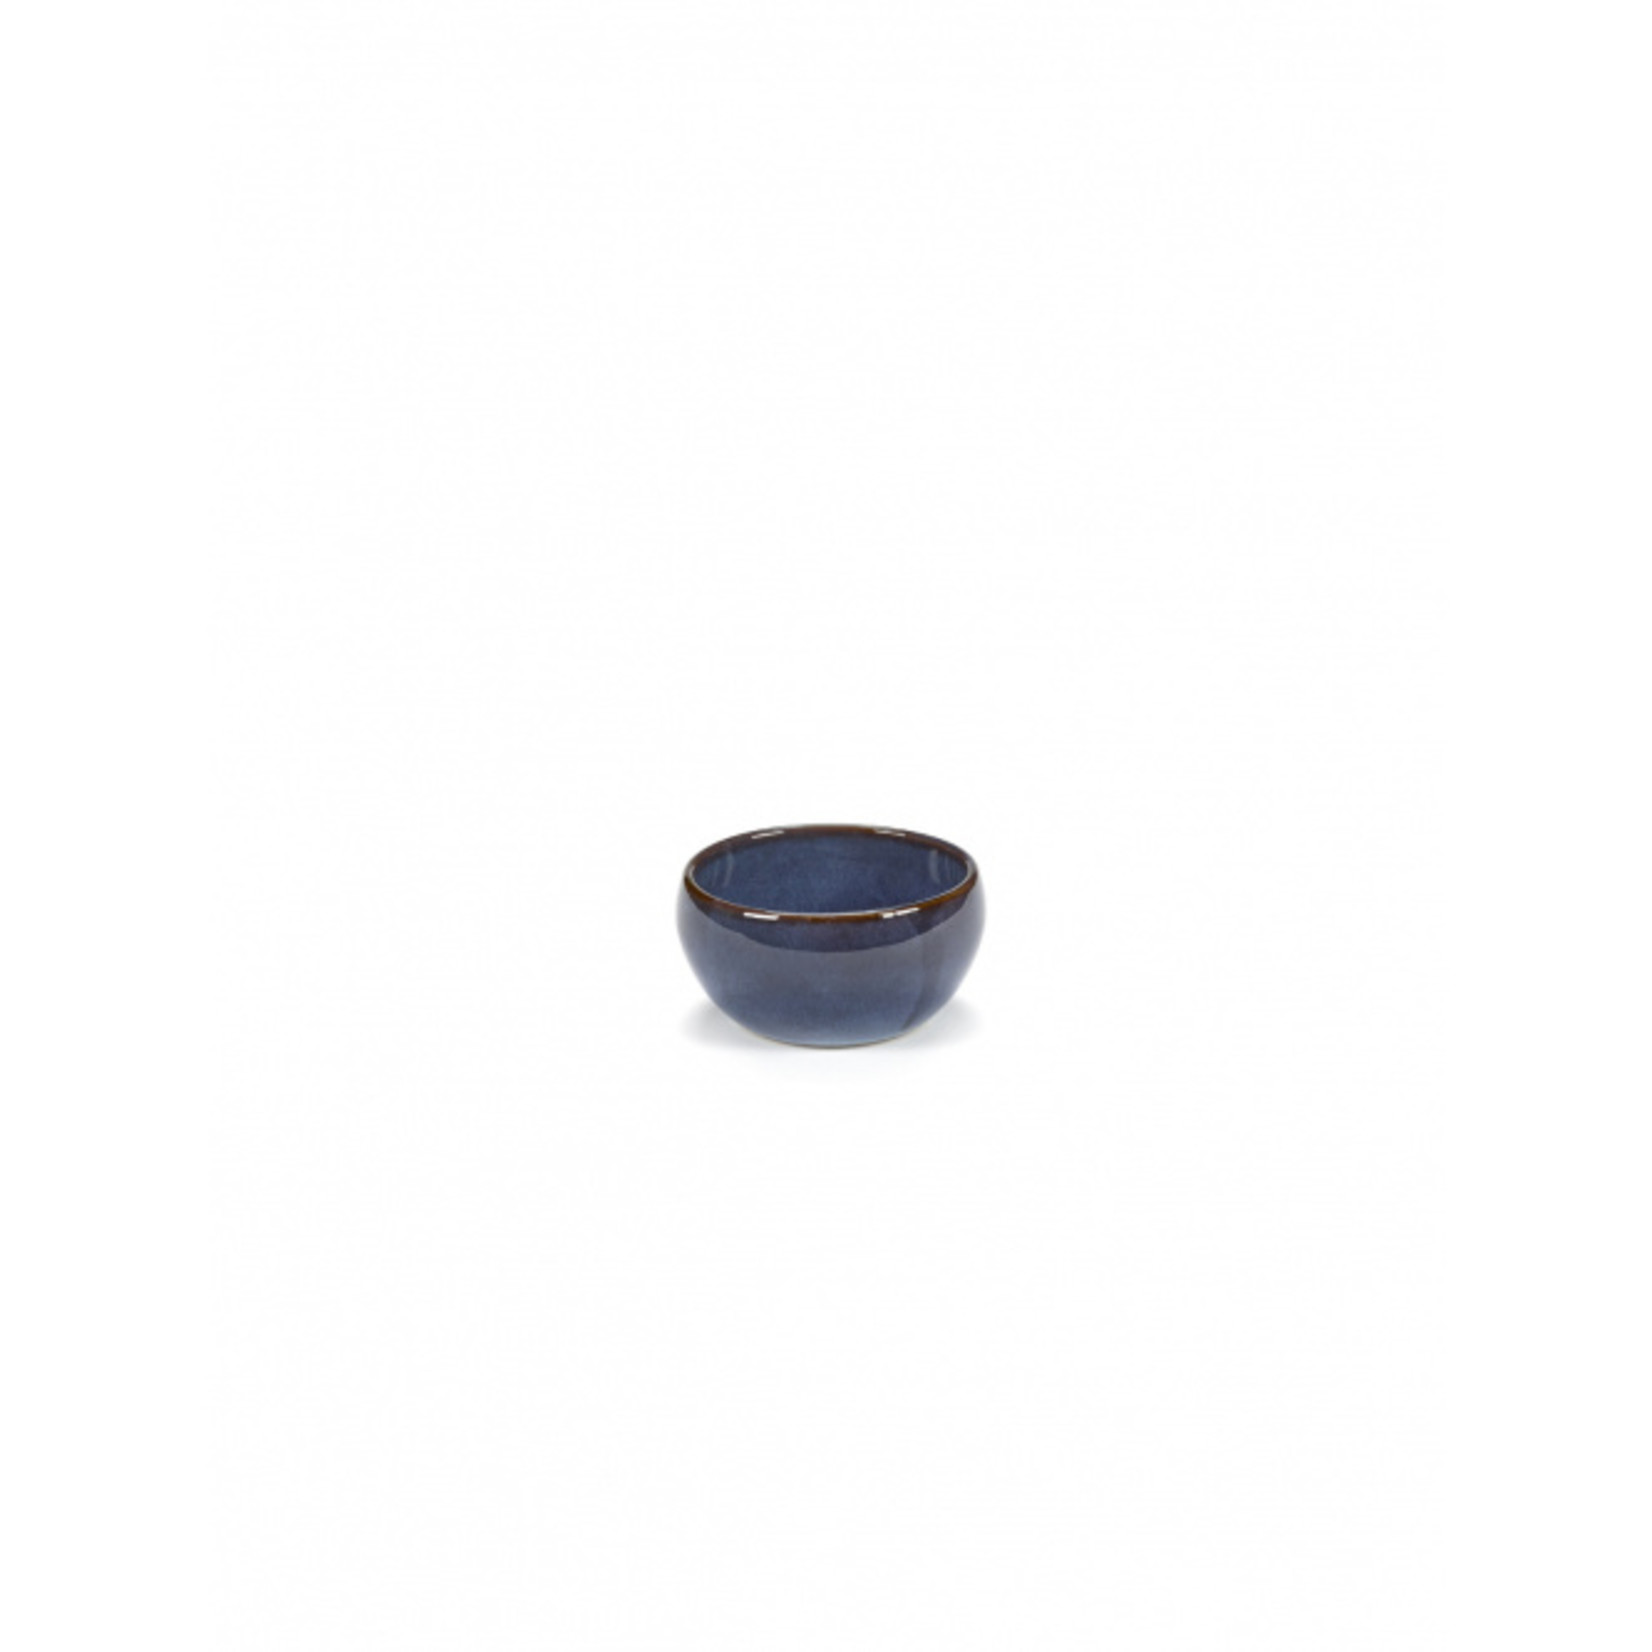 Pascal Naessens collection Pure blue Kommetje Pure blue glazed